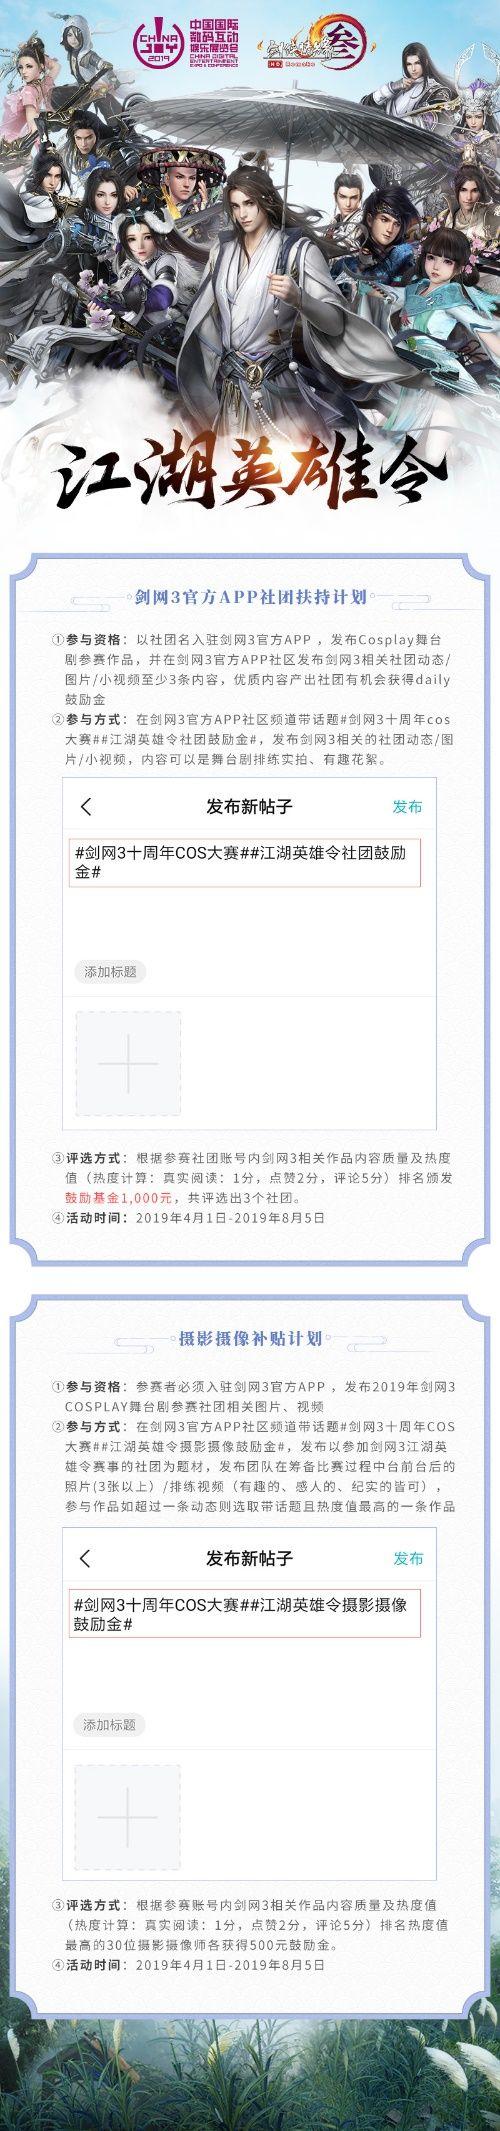 "ChinaJoy携手剑网3再次召集""江湖英雄令""!"